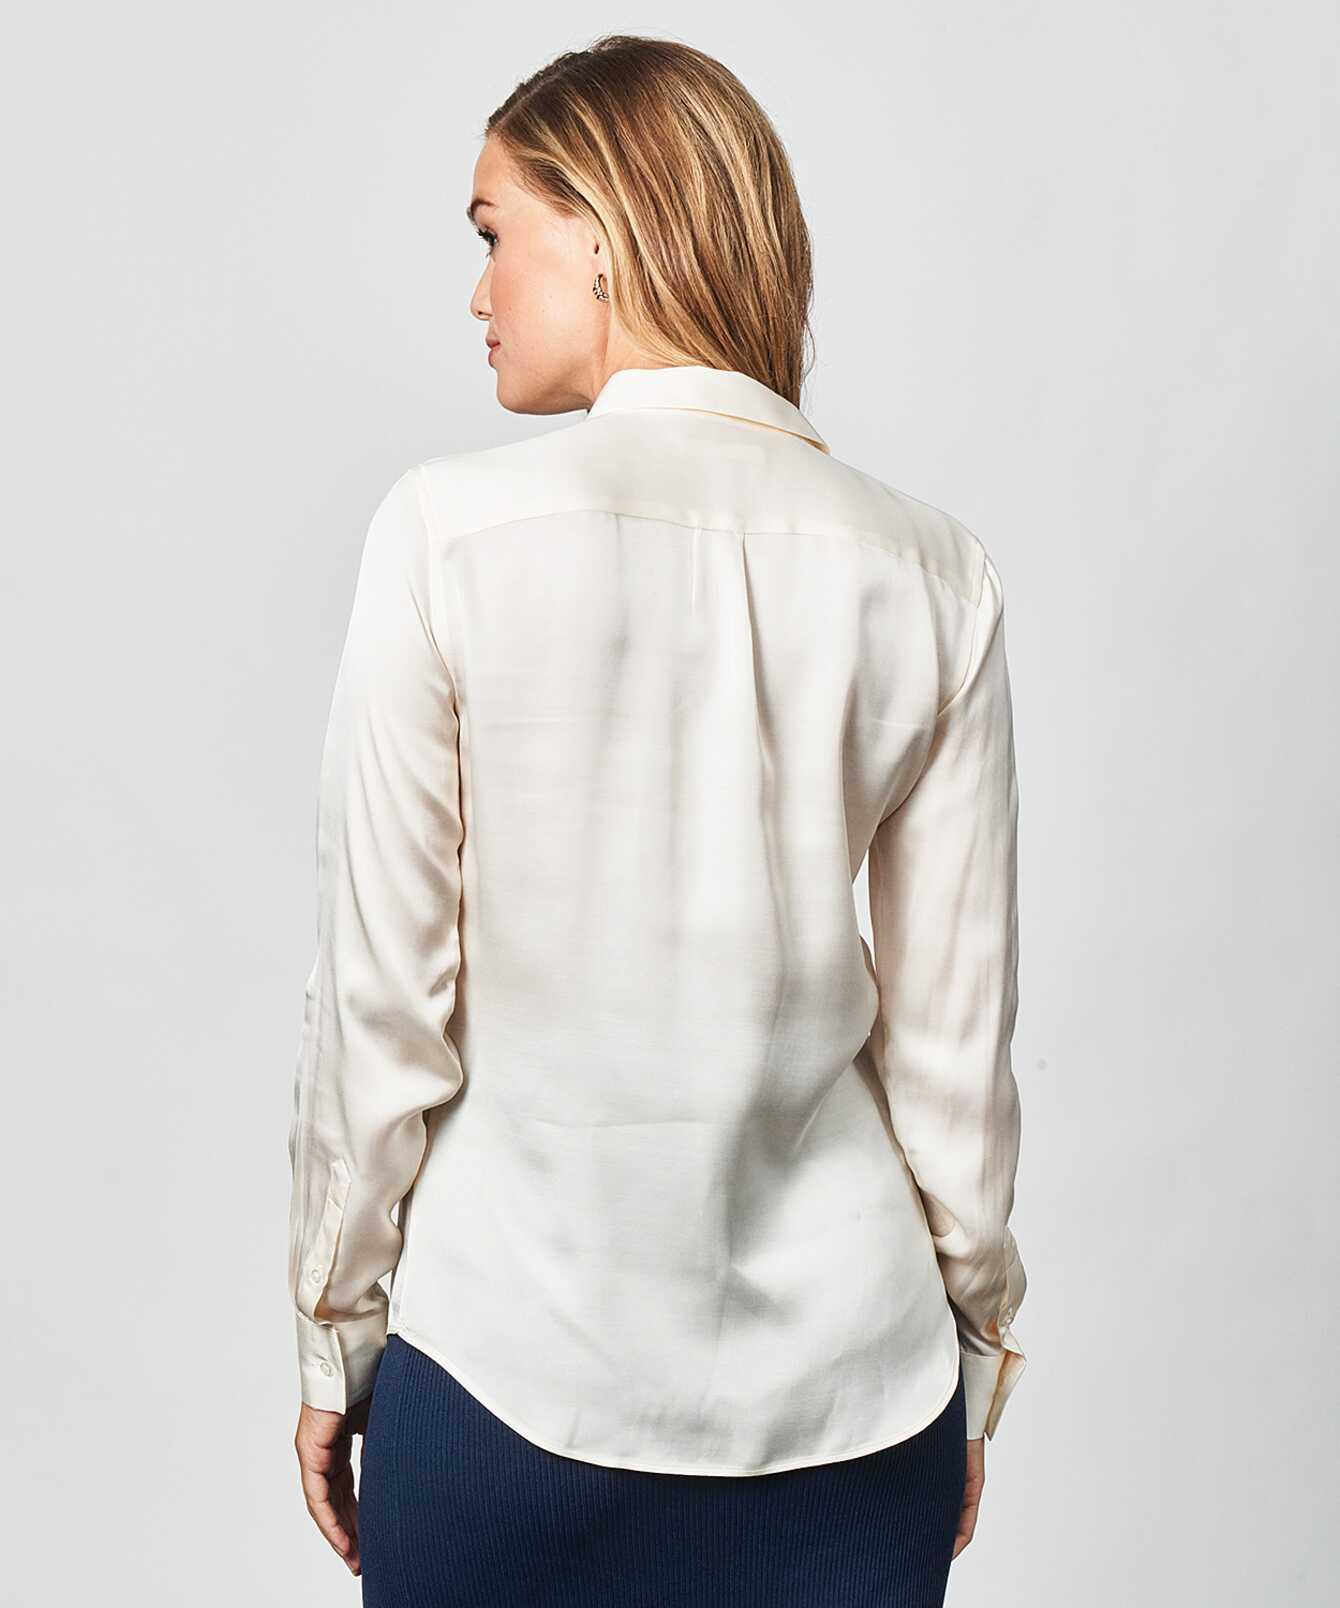 Shirt Tilde Glossy Cream The Shirt Factory